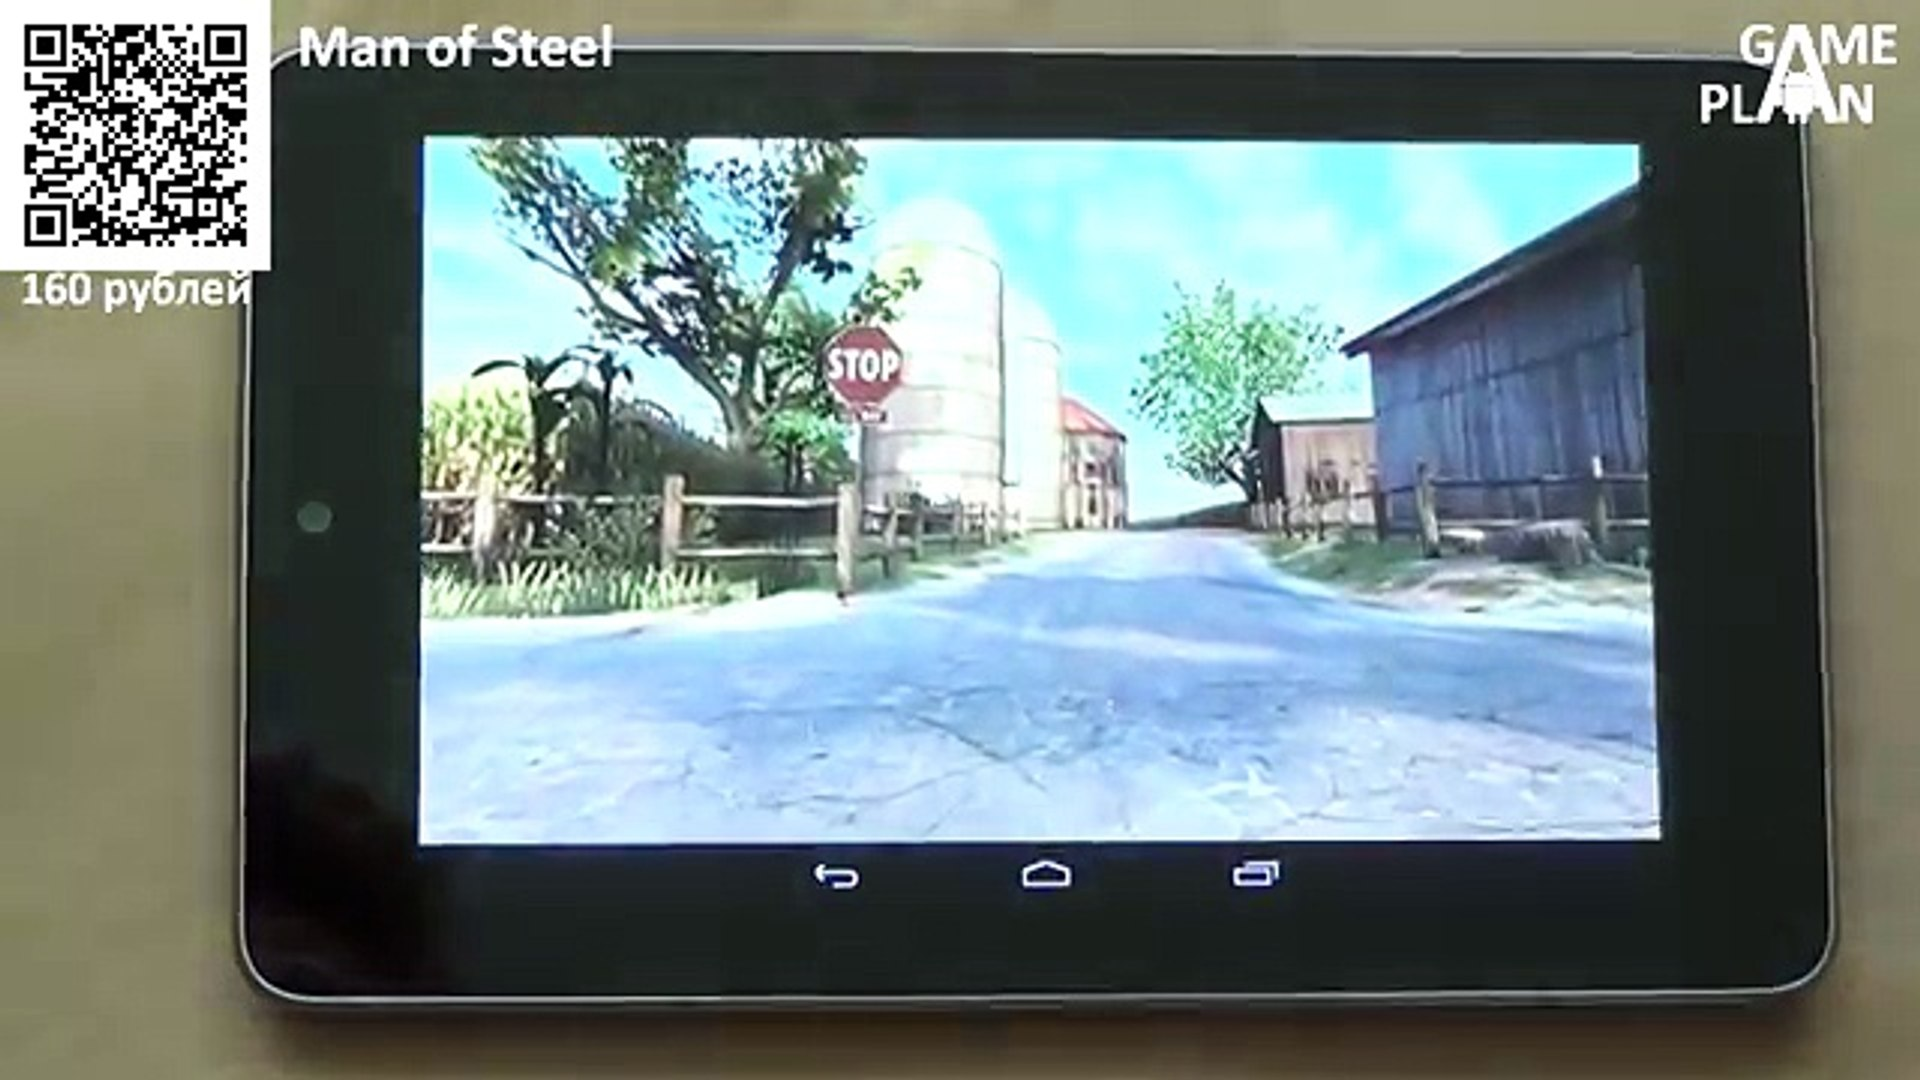 Обзор Review Человек из стали (Man of Steel) от Game Plan